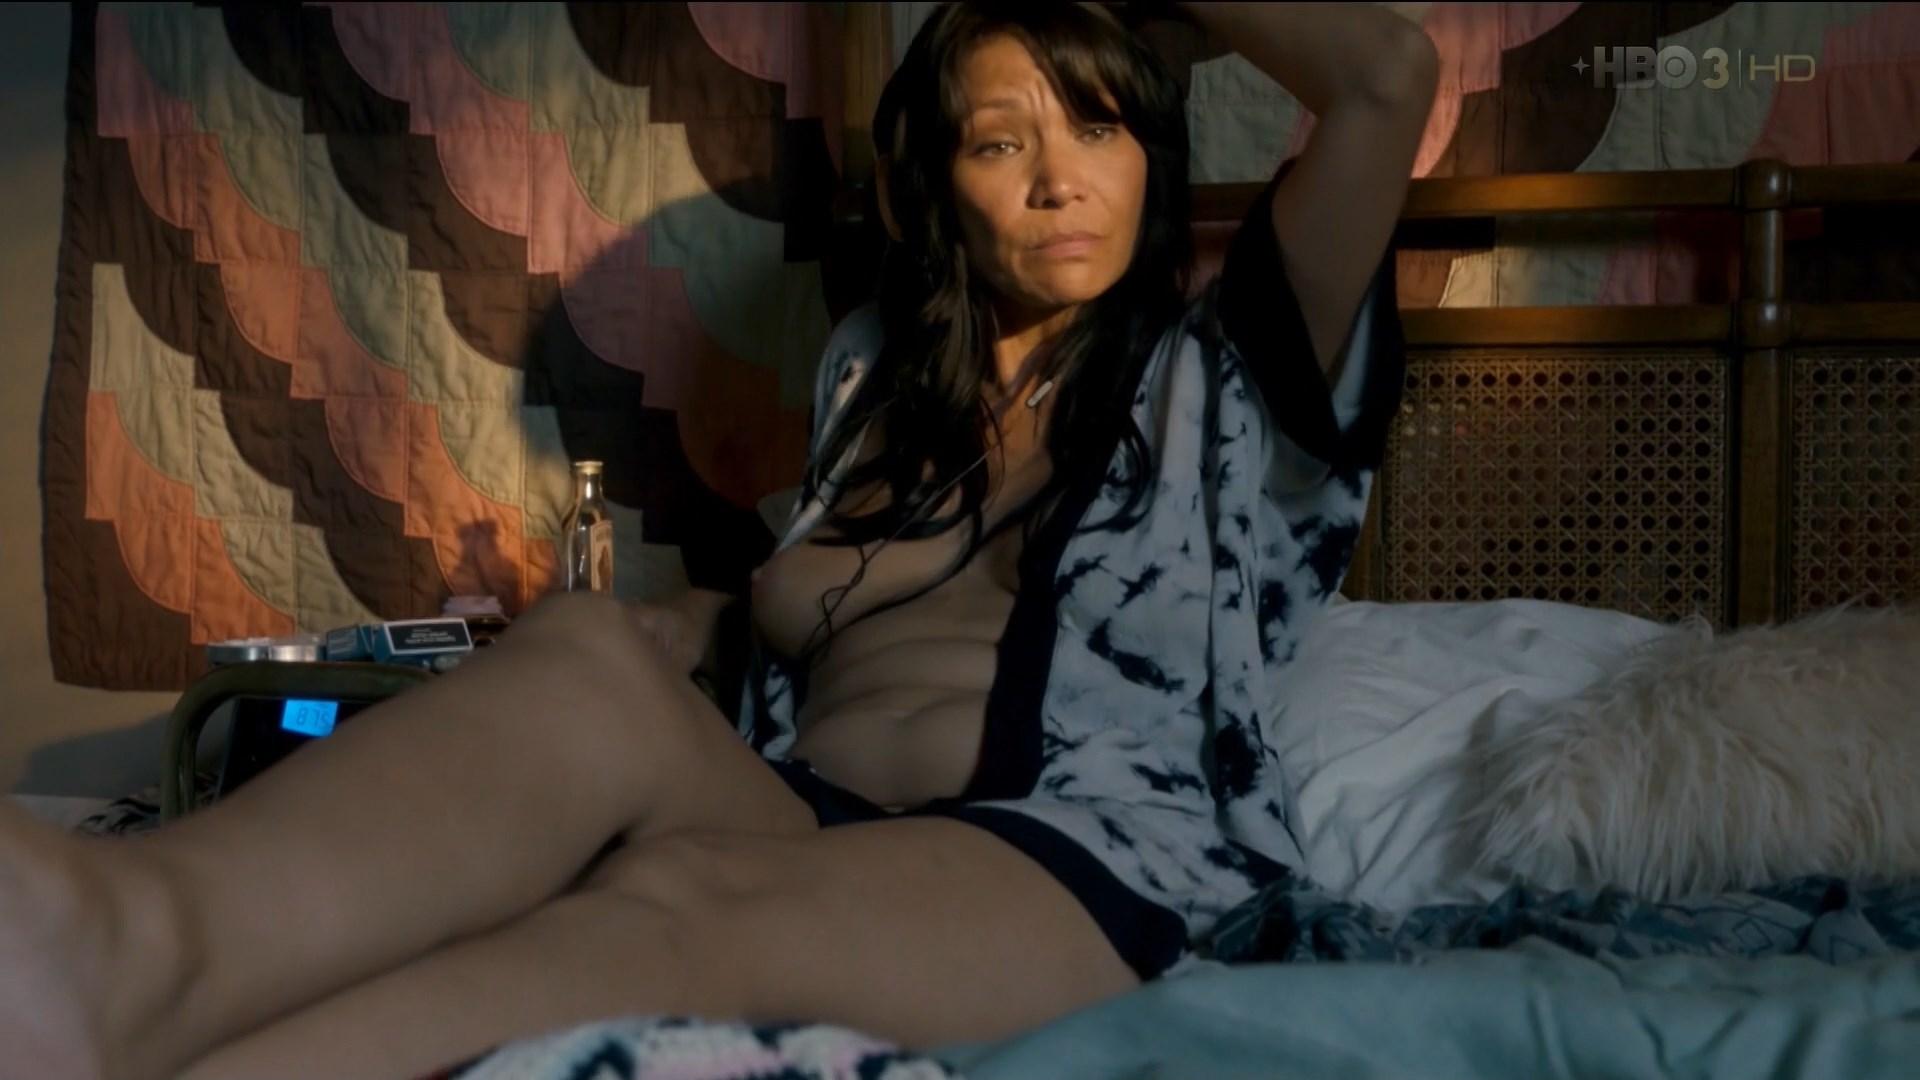 Angela Sarafyan Tits celebs nude video - nudecelebvideo » page 330